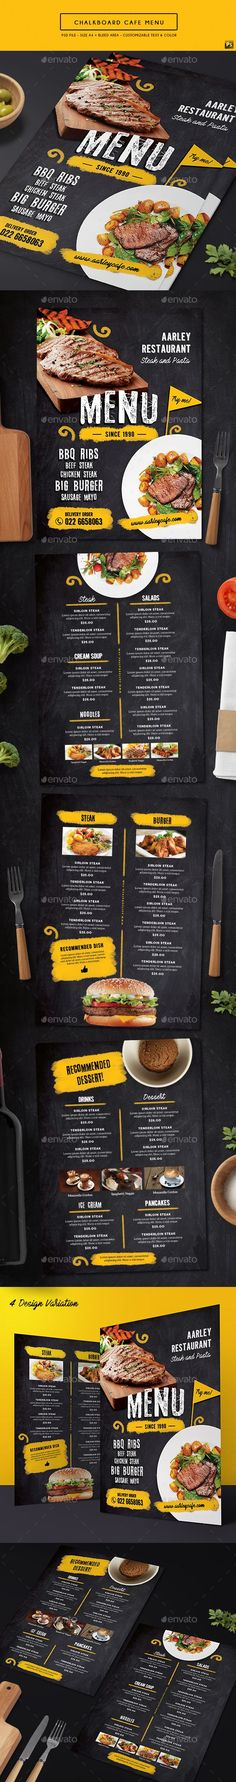 Chalkboard Cafe Menu — Photoshop PSD #classic #print template • Download ➝ https://graphicriver.net/item/chalkboard-cafe-menu/19514143?ref=pxcr